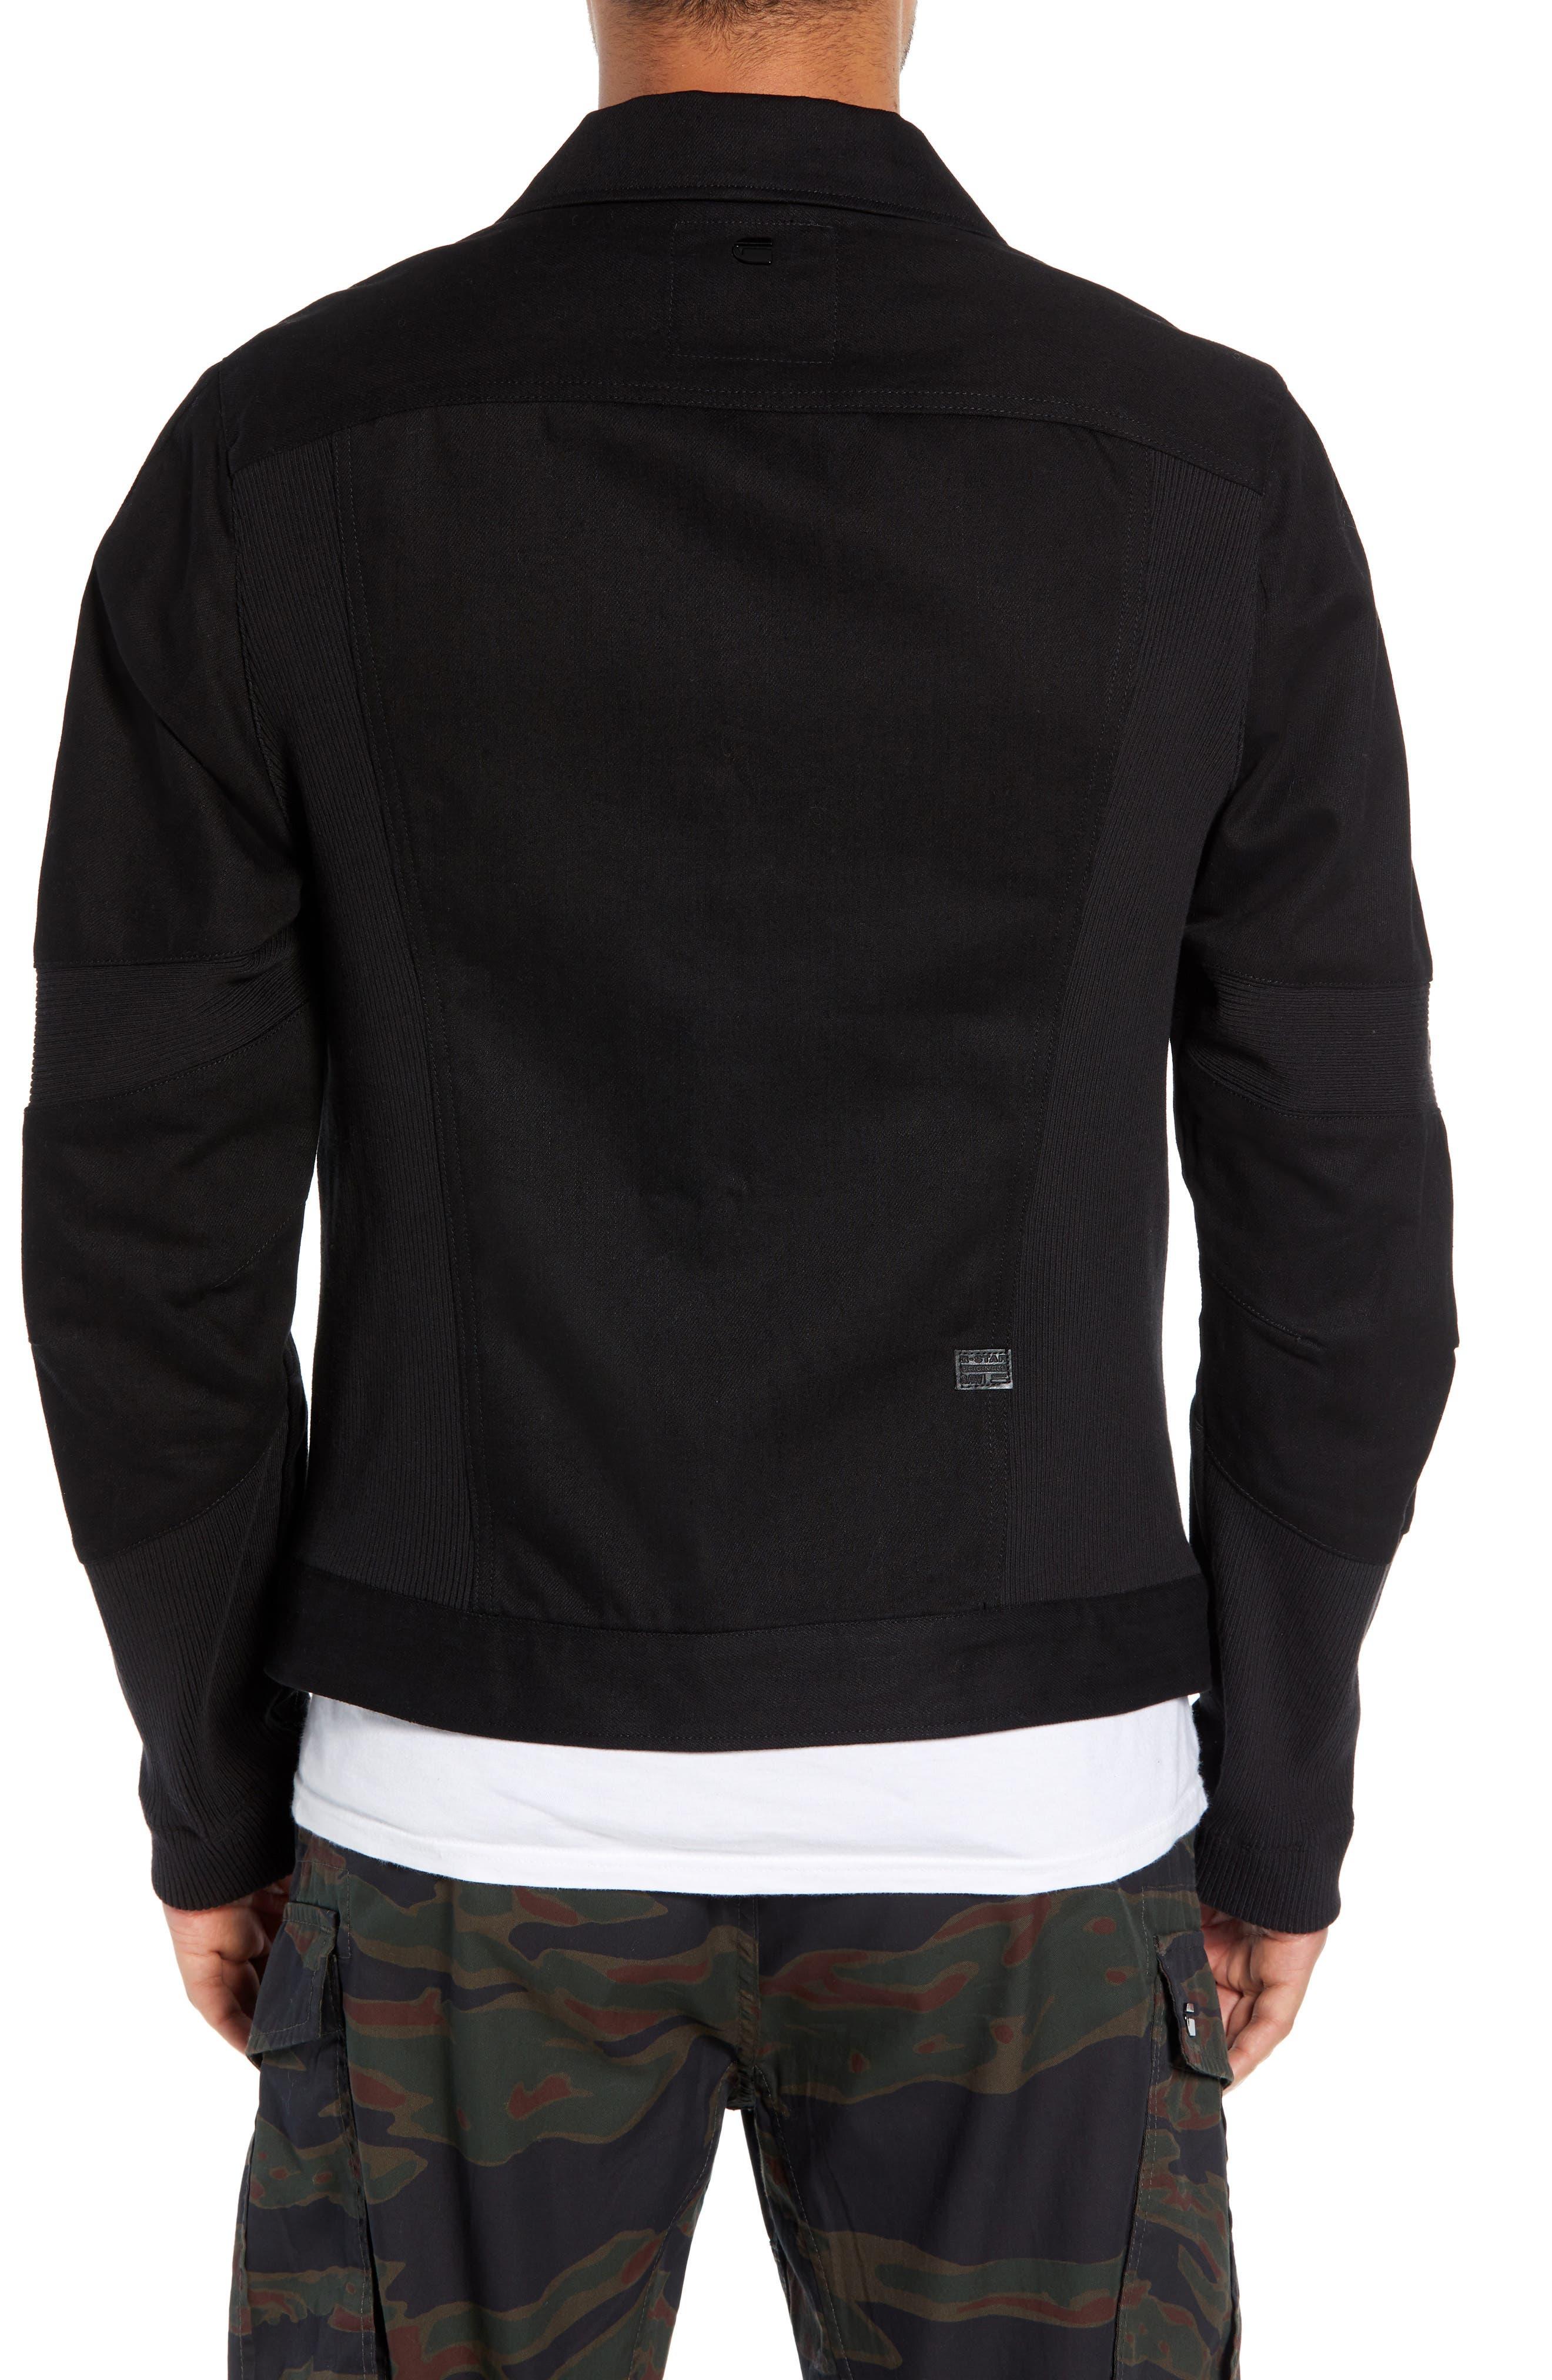 Motac-X Moto Uni Slim Cotton Denim Jacket,                             Alternate thumbnail 2, color,                             RAW DENIM